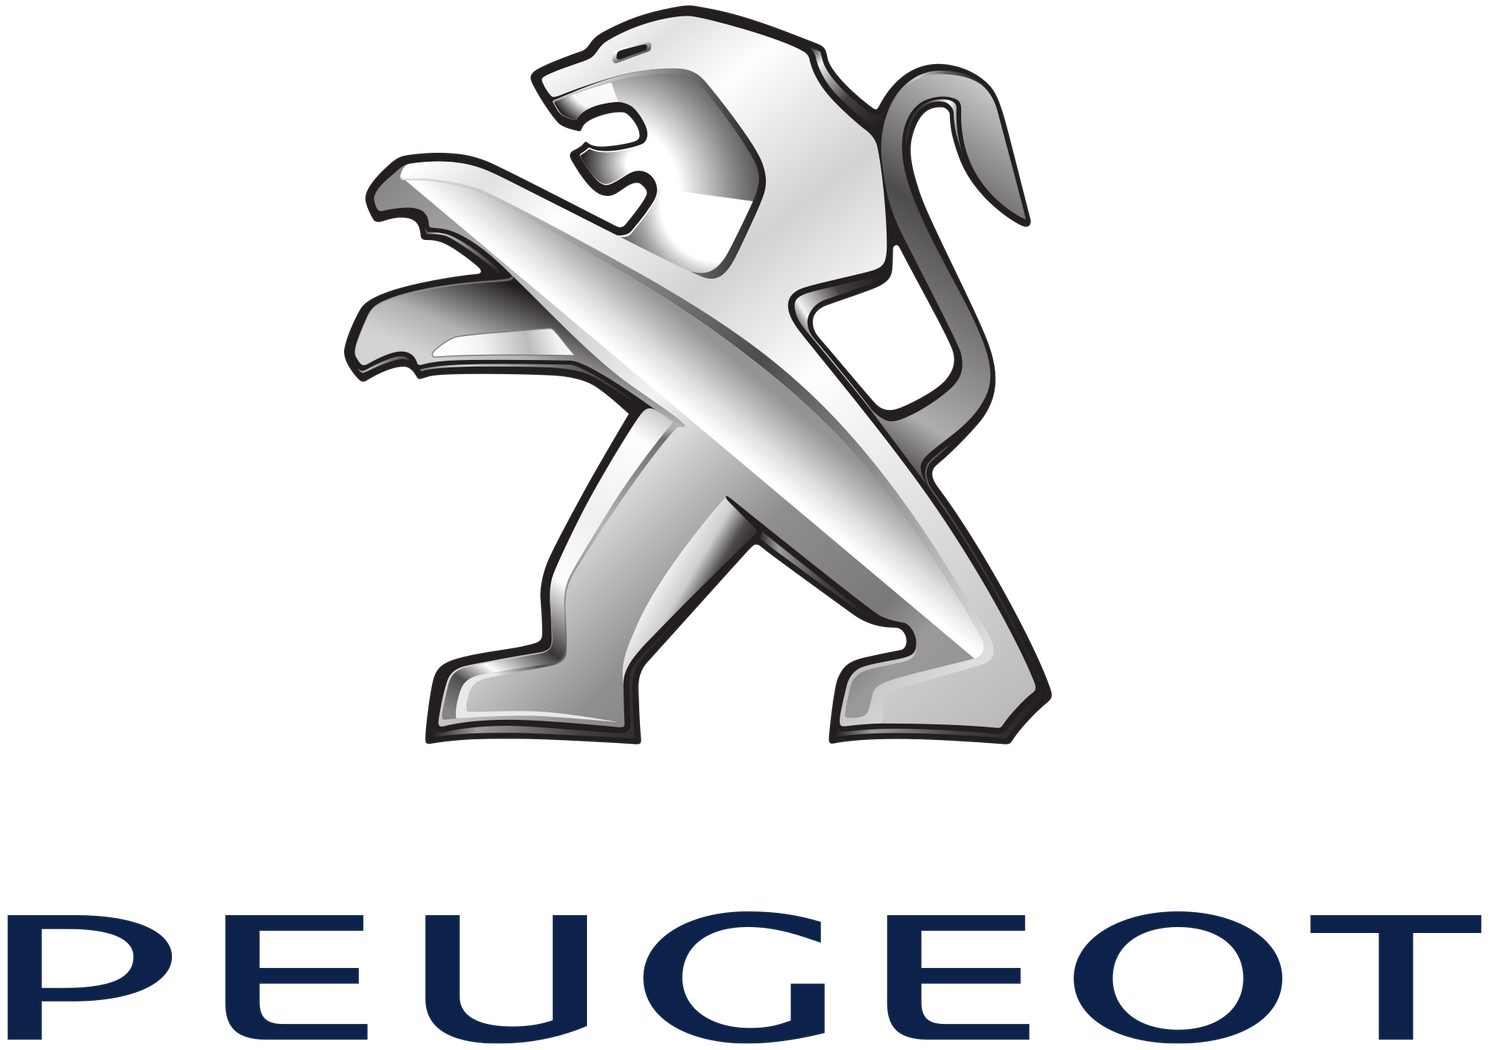 Logotipo da Peugeot